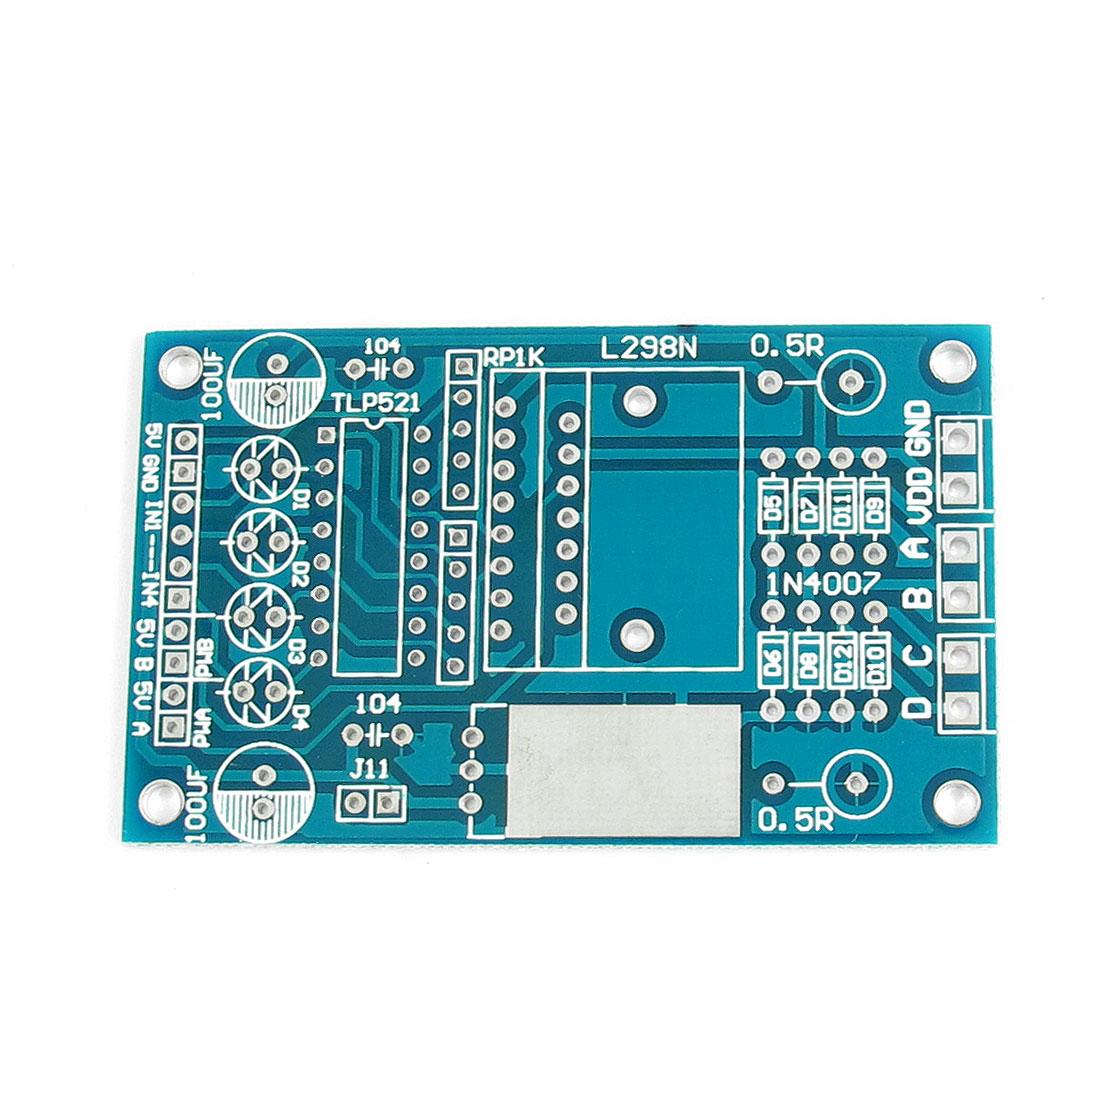 L298N DC Stepper Motor Driver Control Module PCB Blank Board 68mm x 41mm